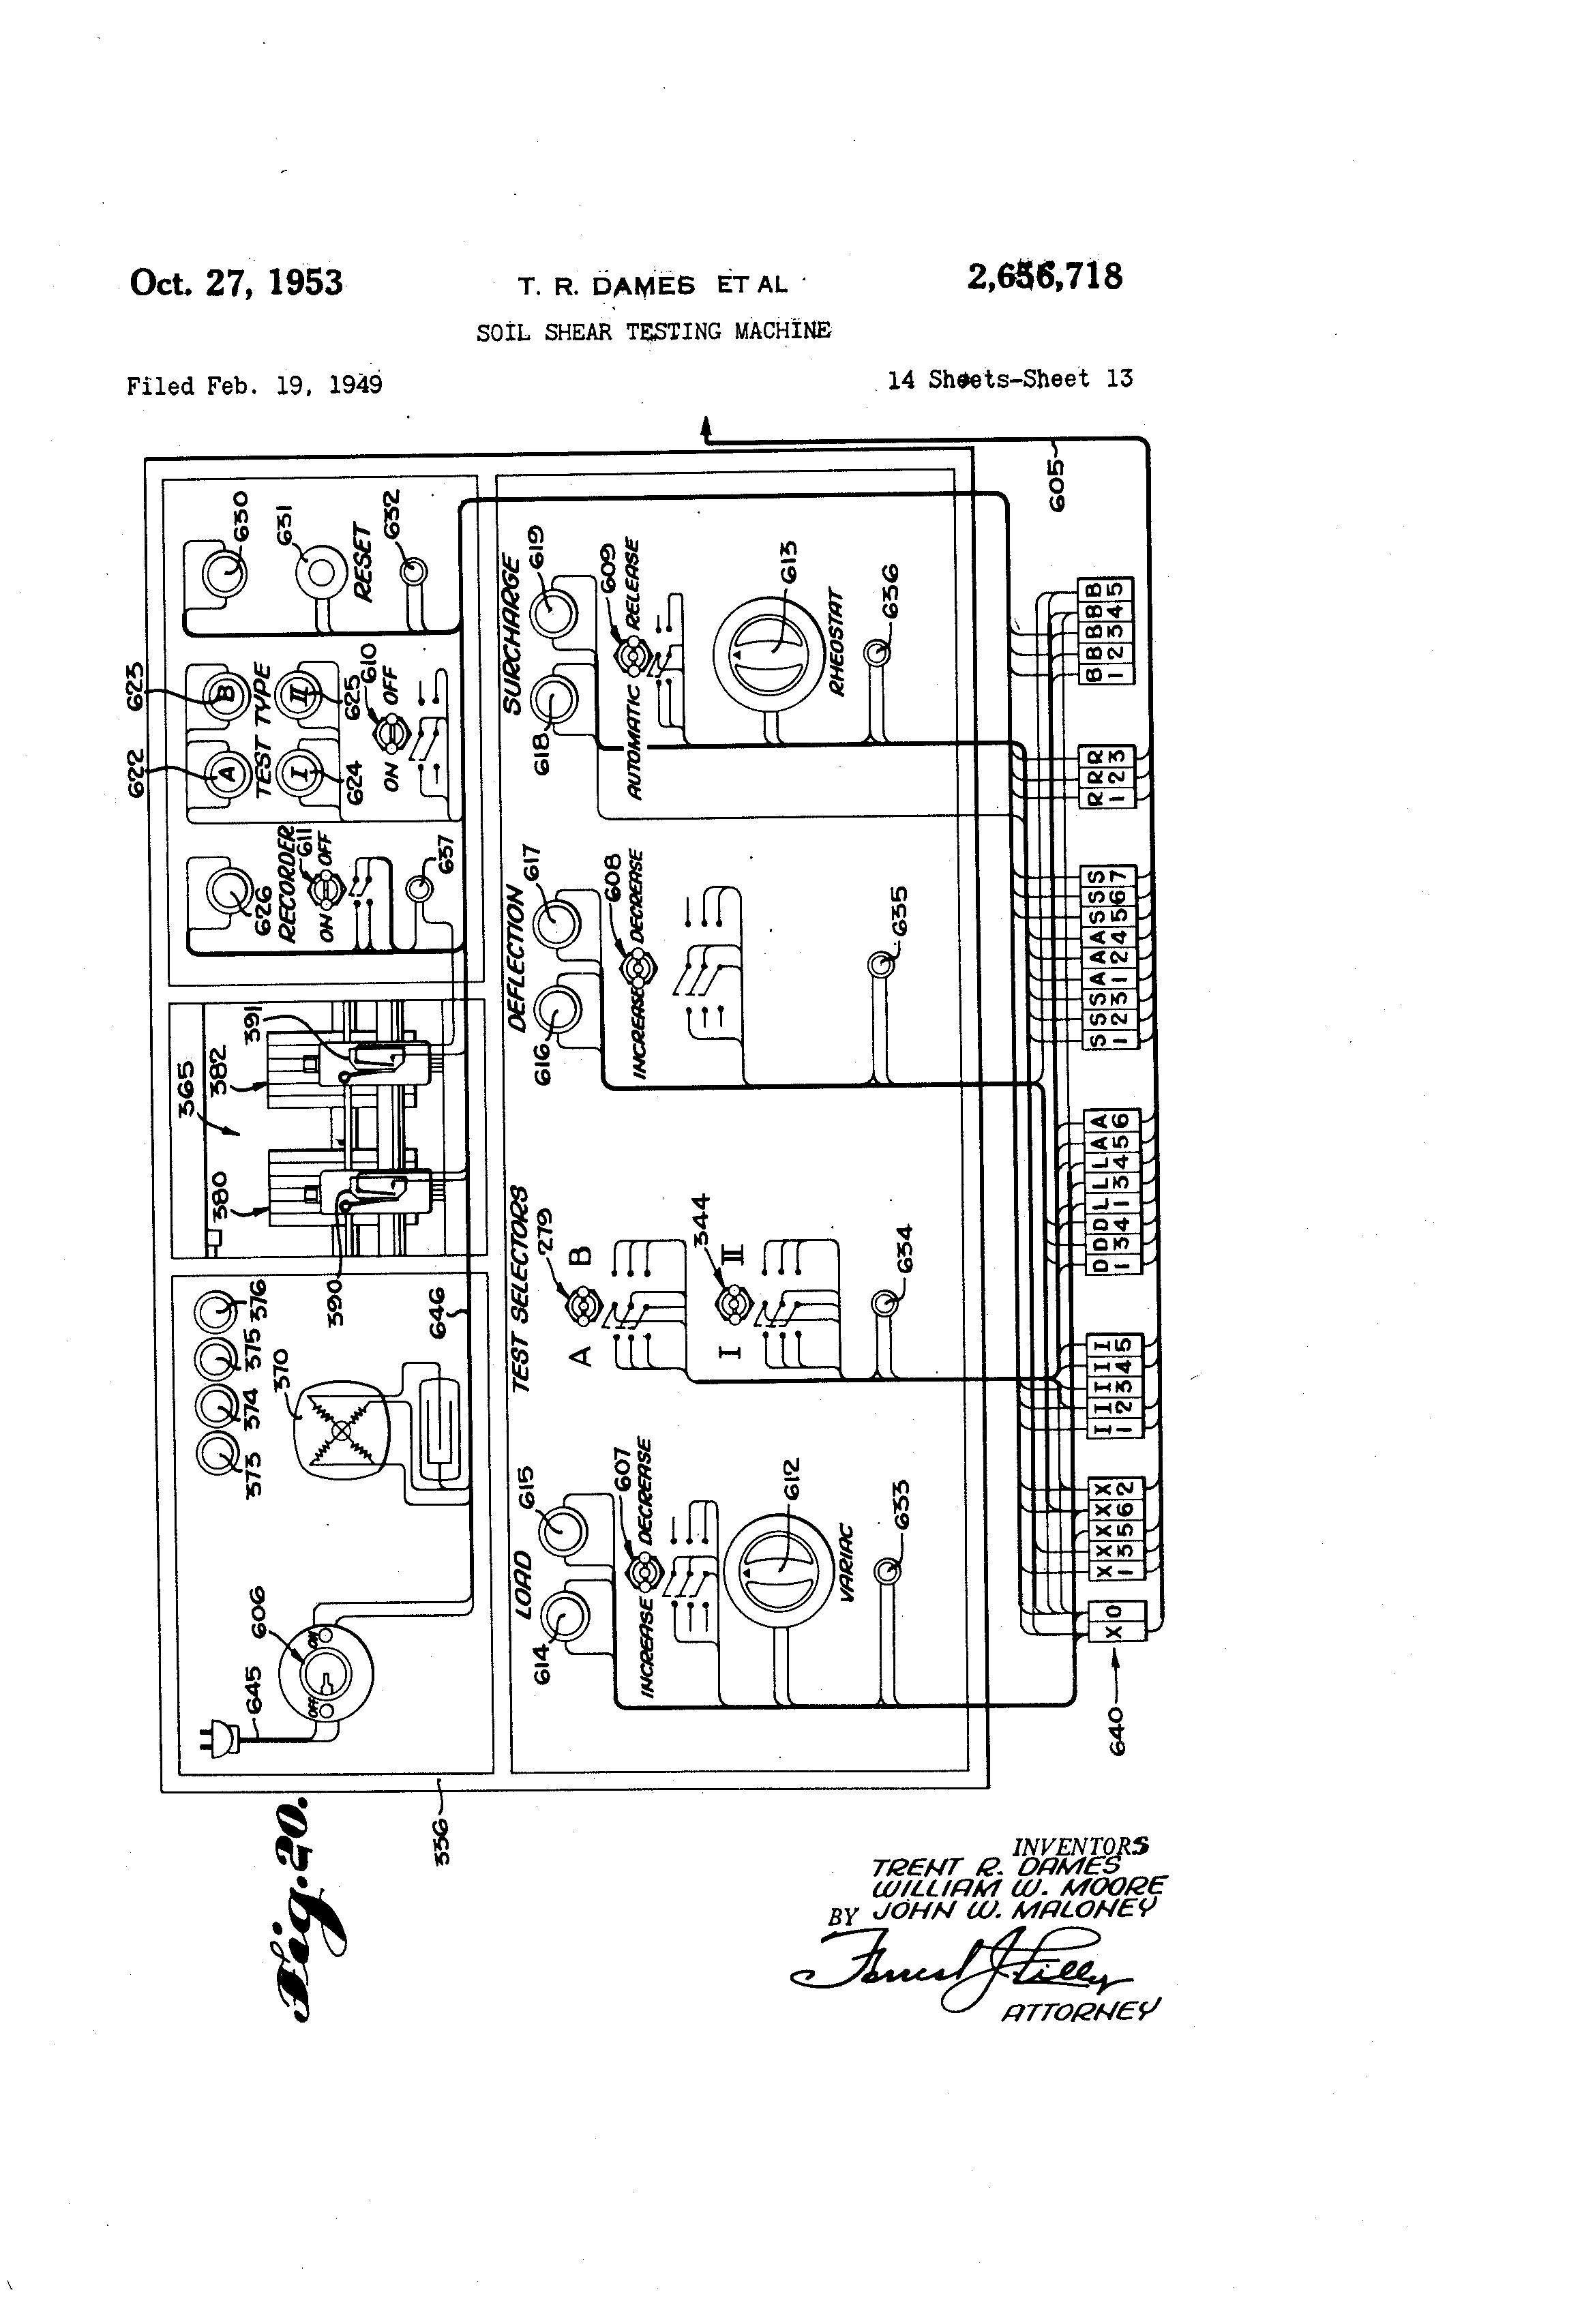 US2656718 12 patent us2656718 soil shear testing machine google patents hub2b wiring diagram at soozxer.org